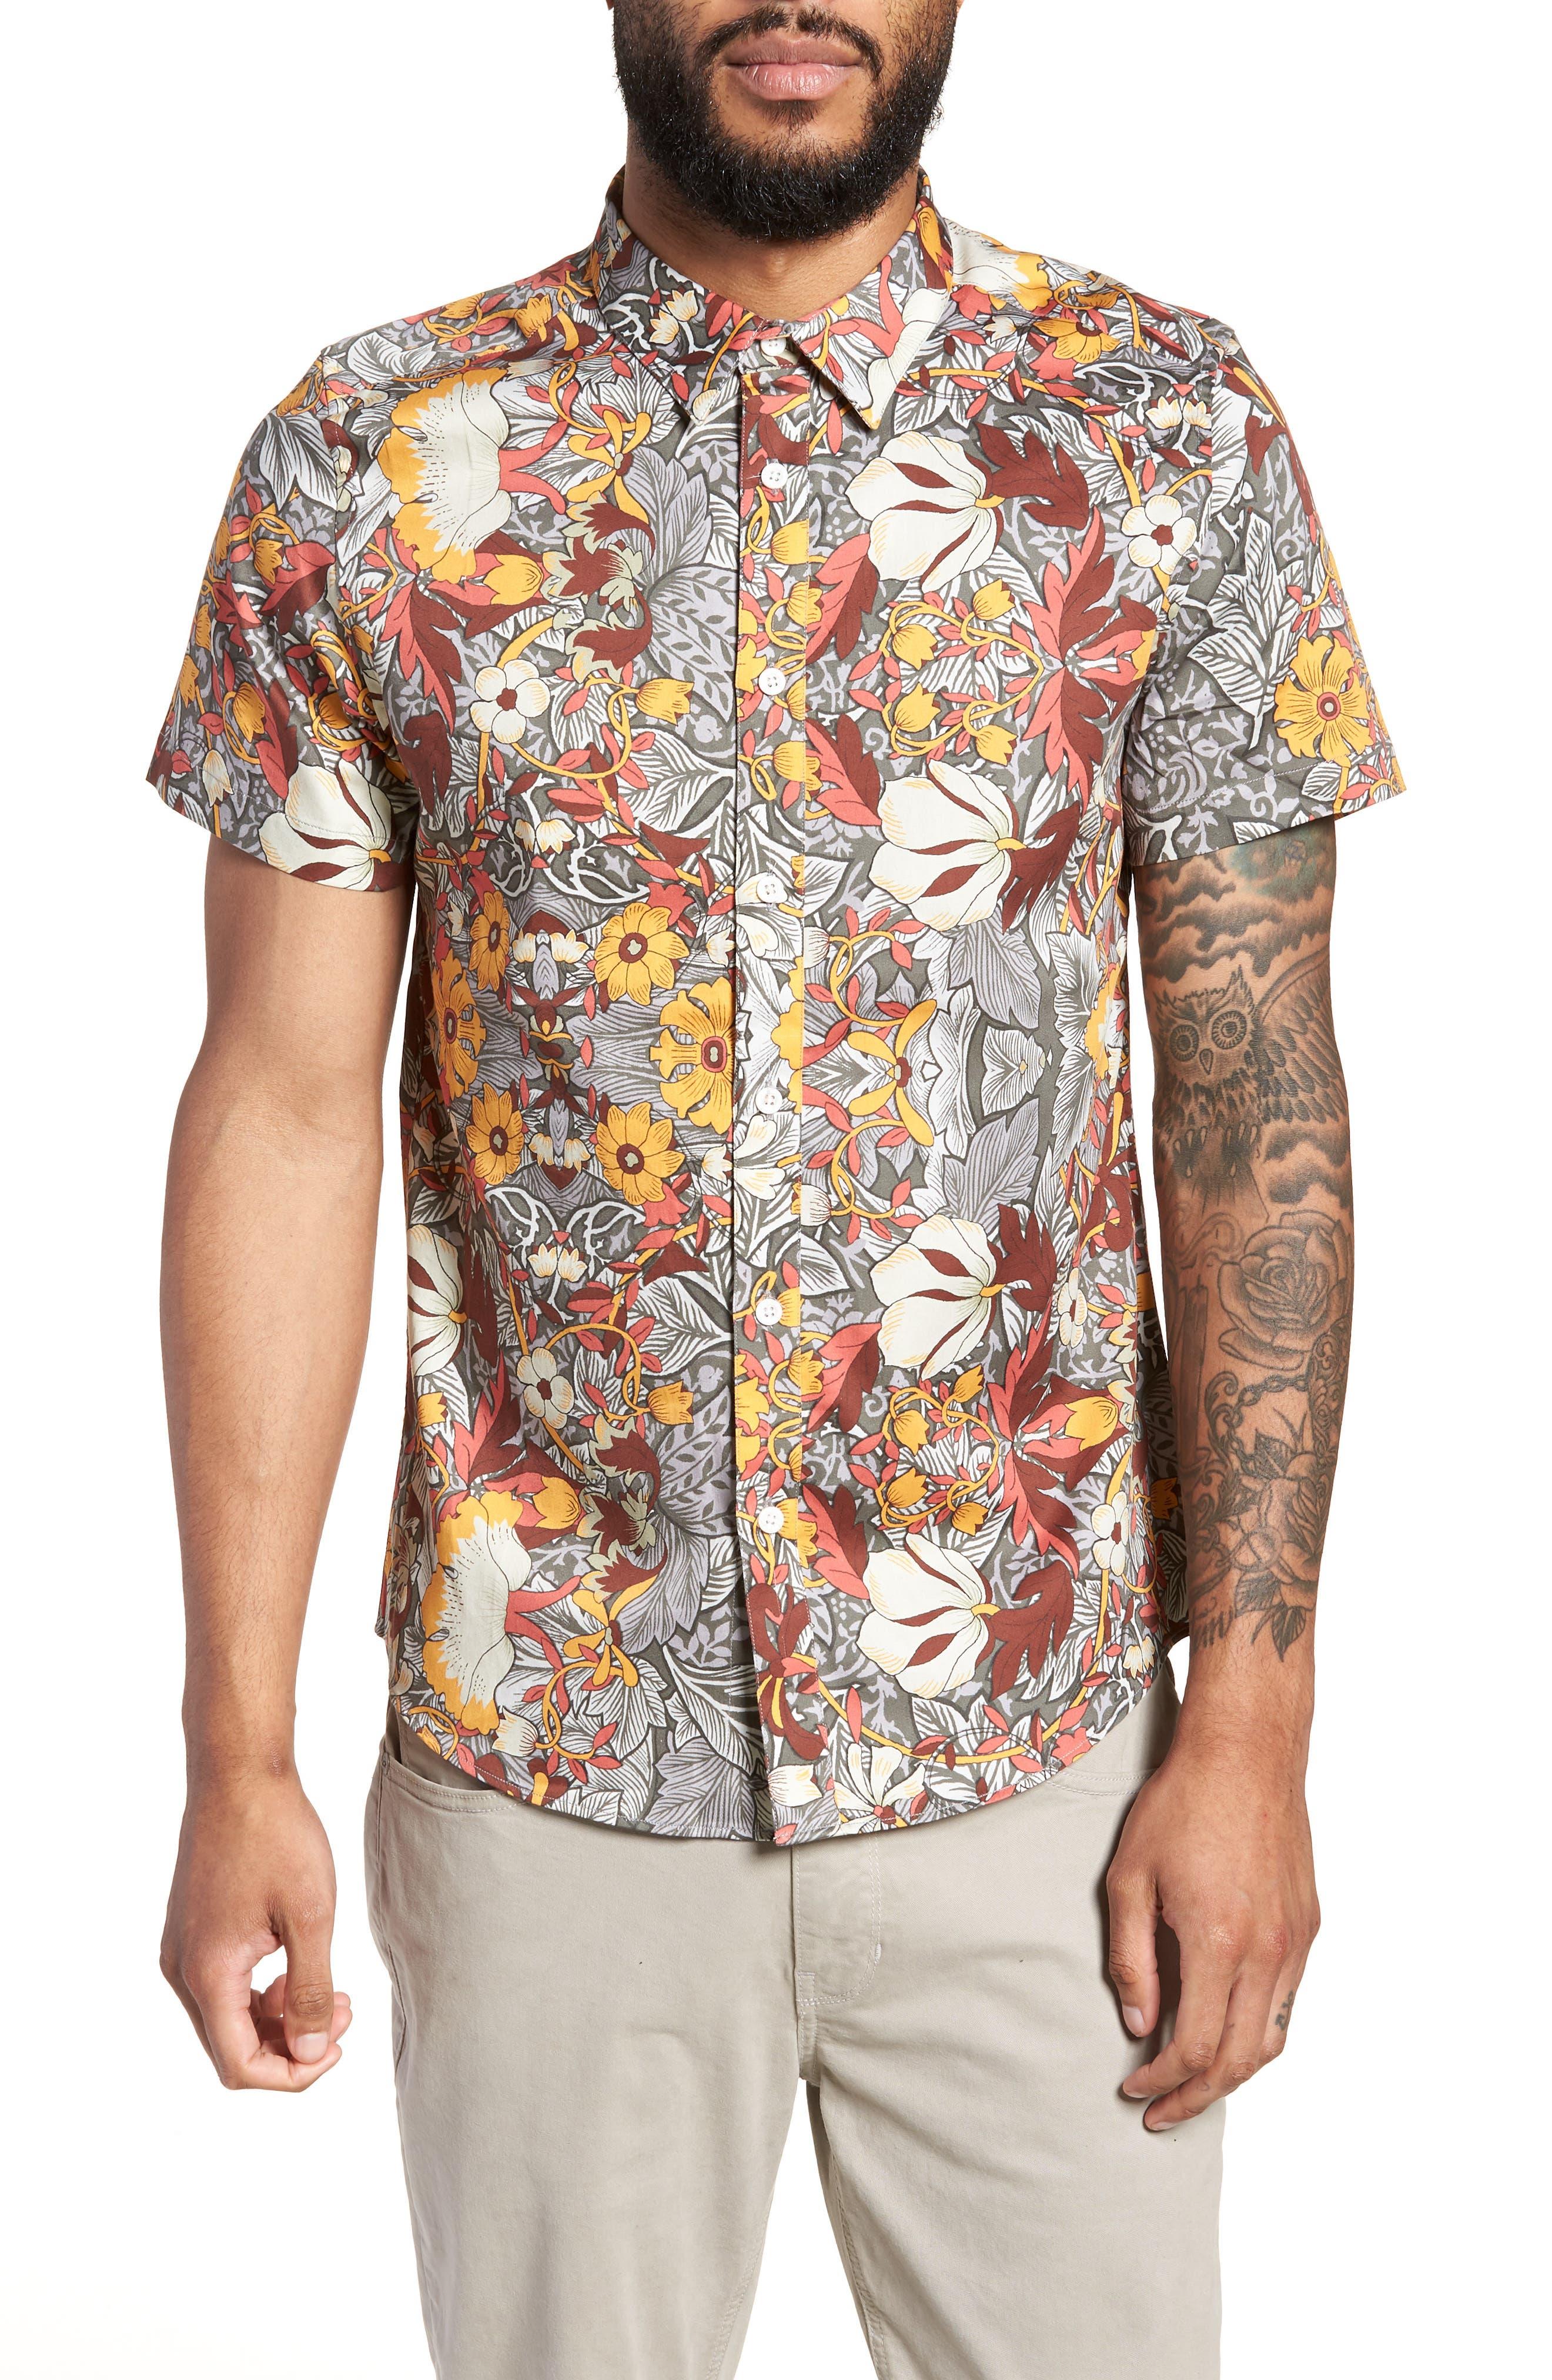 TWENTYMETRICTONS Trim Fit Woven Short Sleeve Shirt